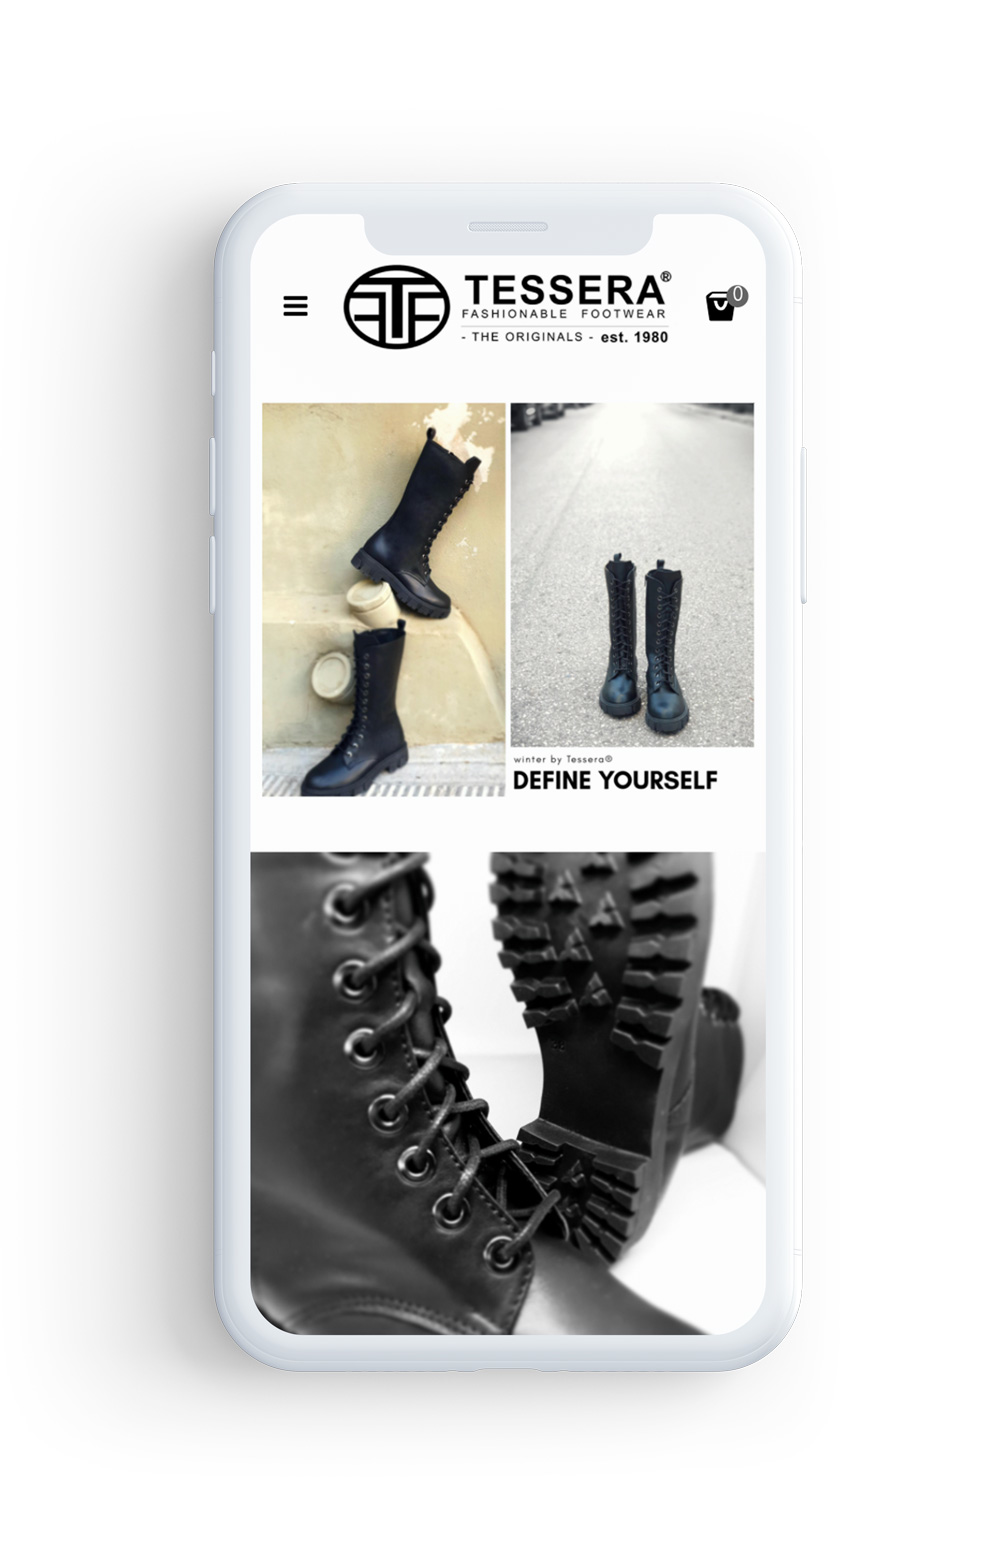 tessera-project-mobile-2